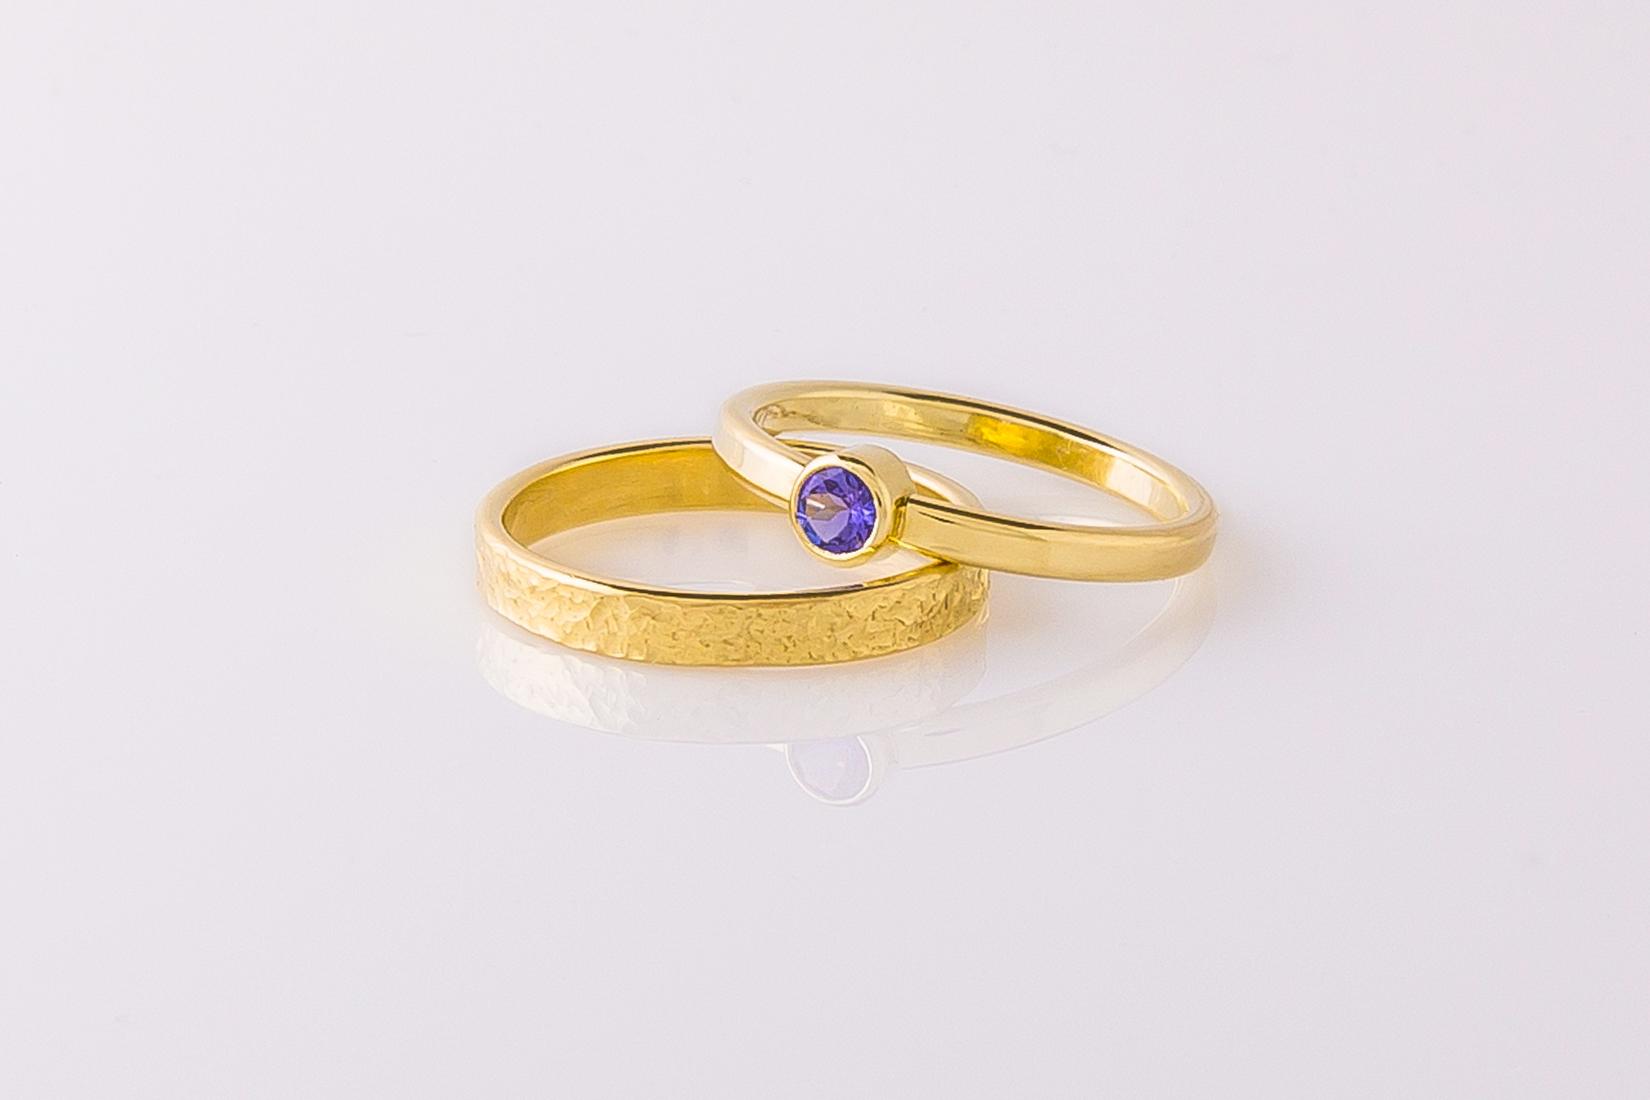 goudmerk-ring-trouwen-geel-goud-grillige-bewerkt-hoogglans-tanzaniet